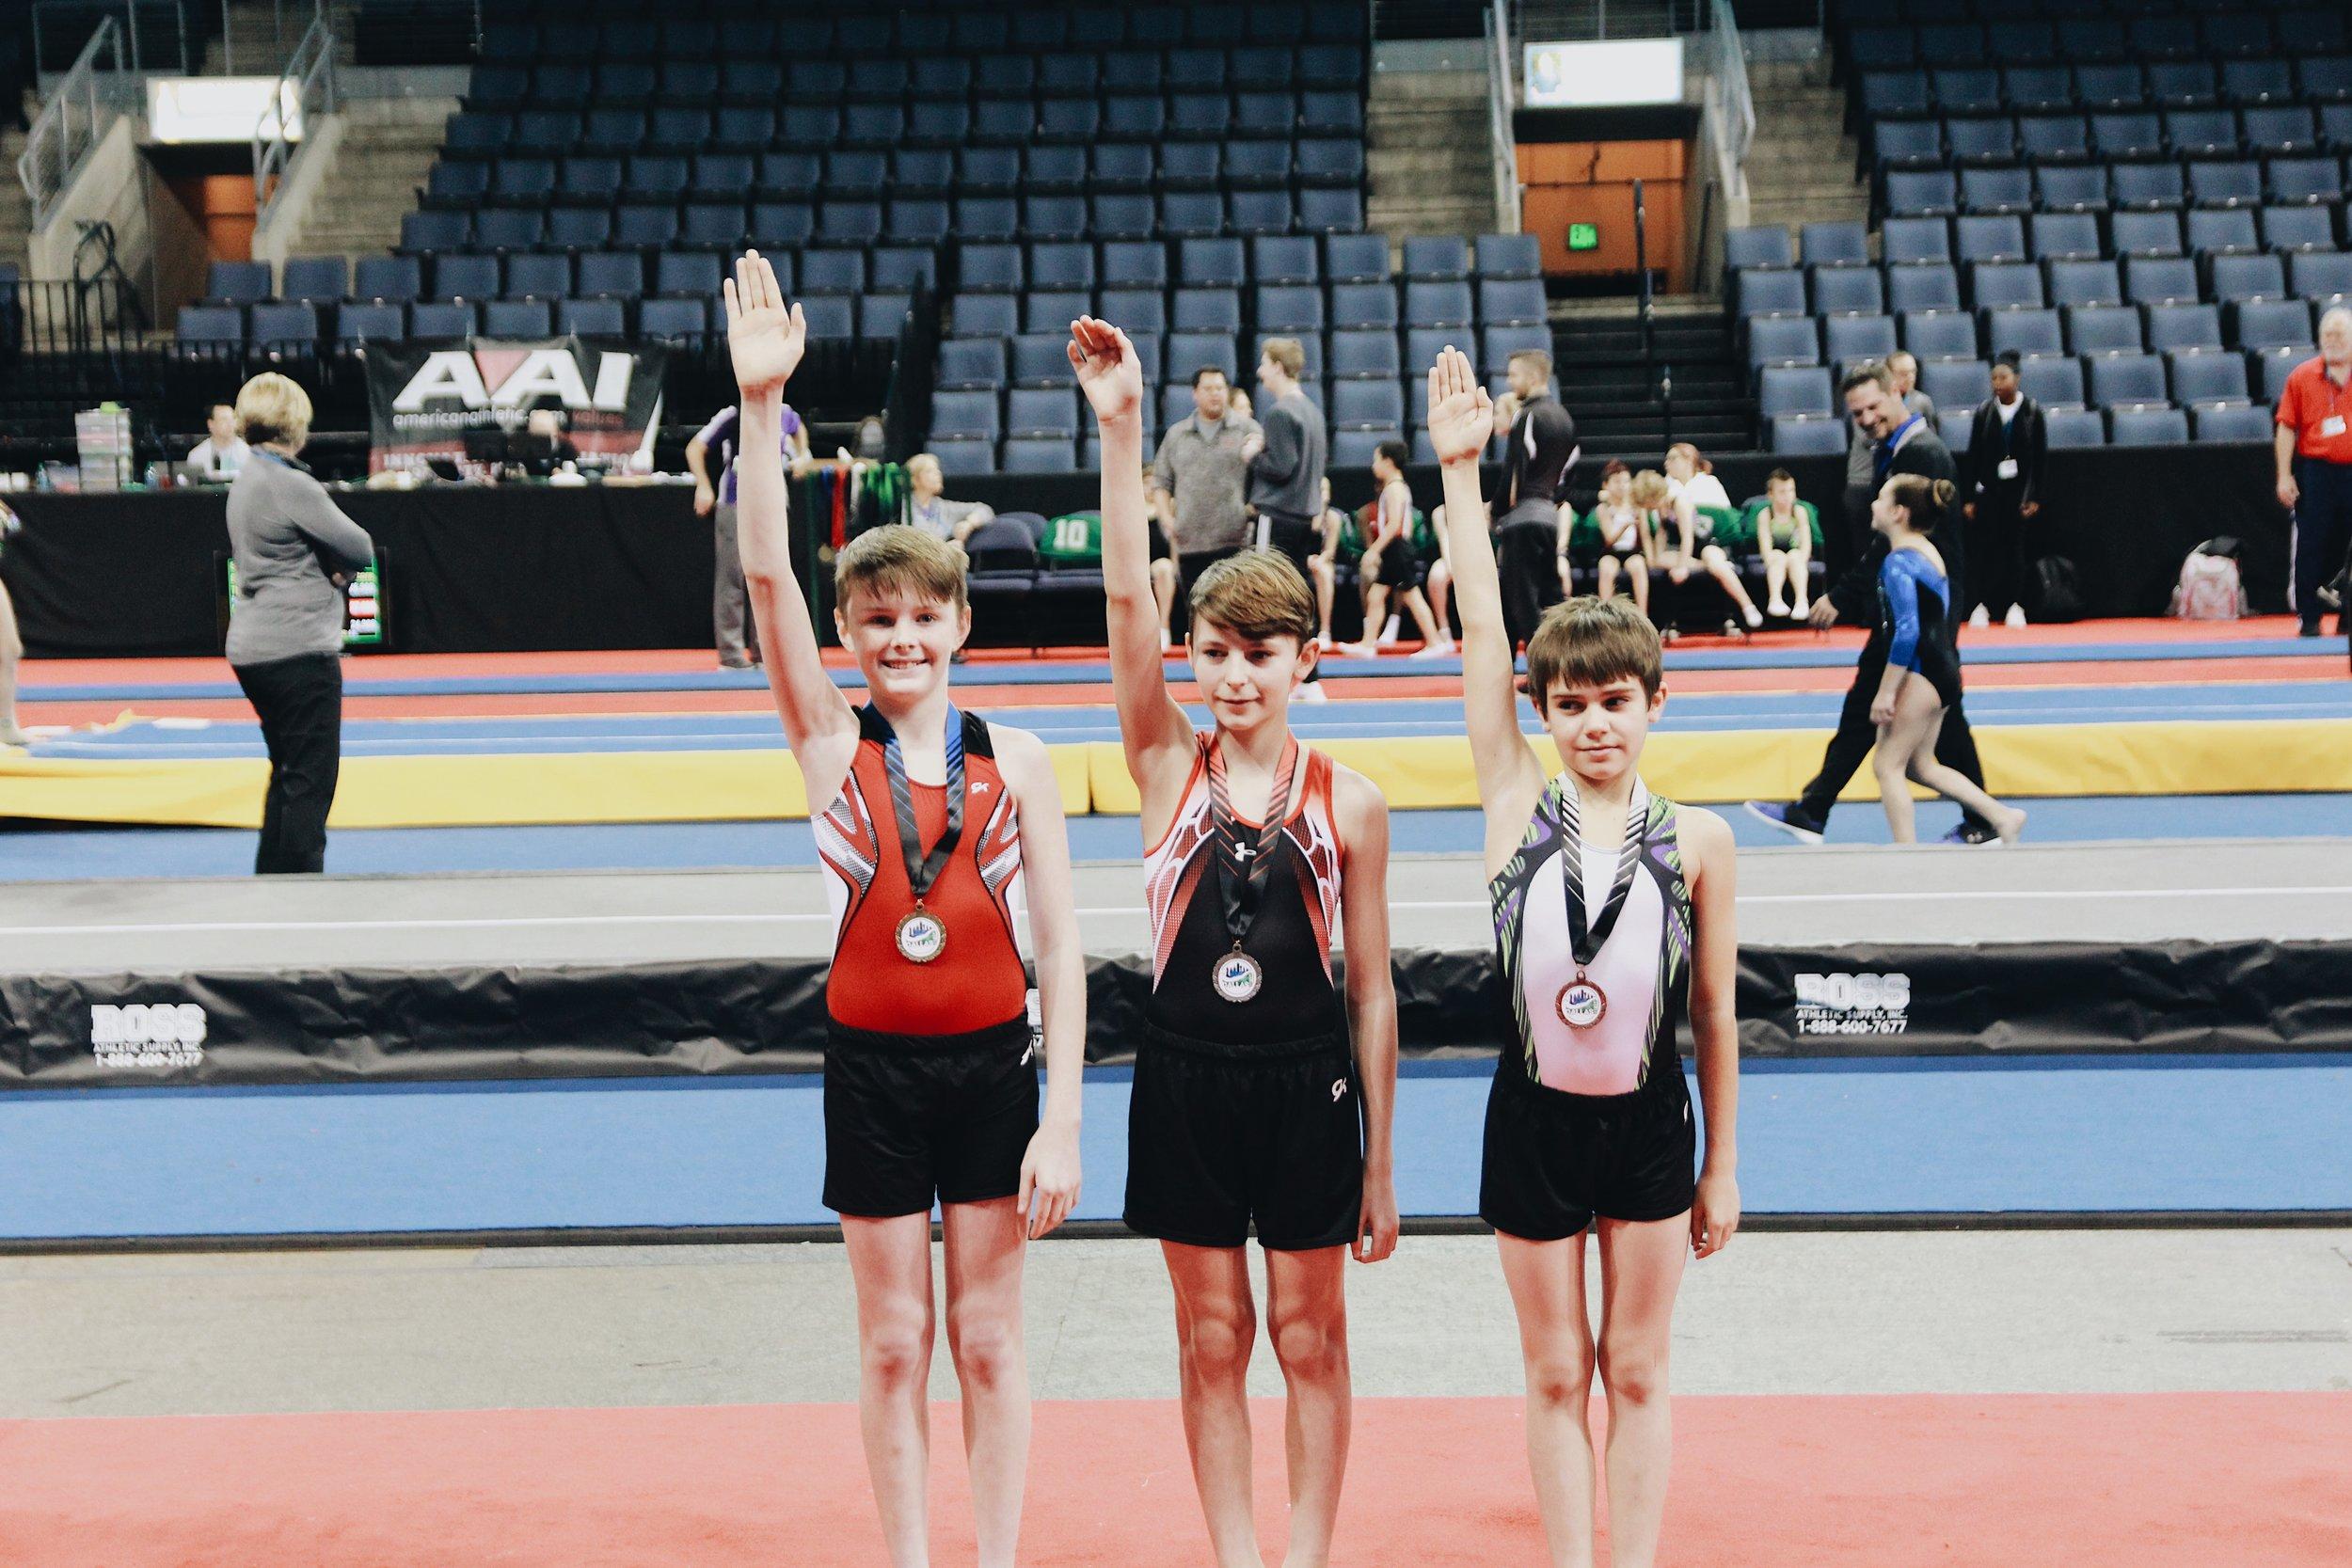 Garrett, far left, saluting with his first place flight award.